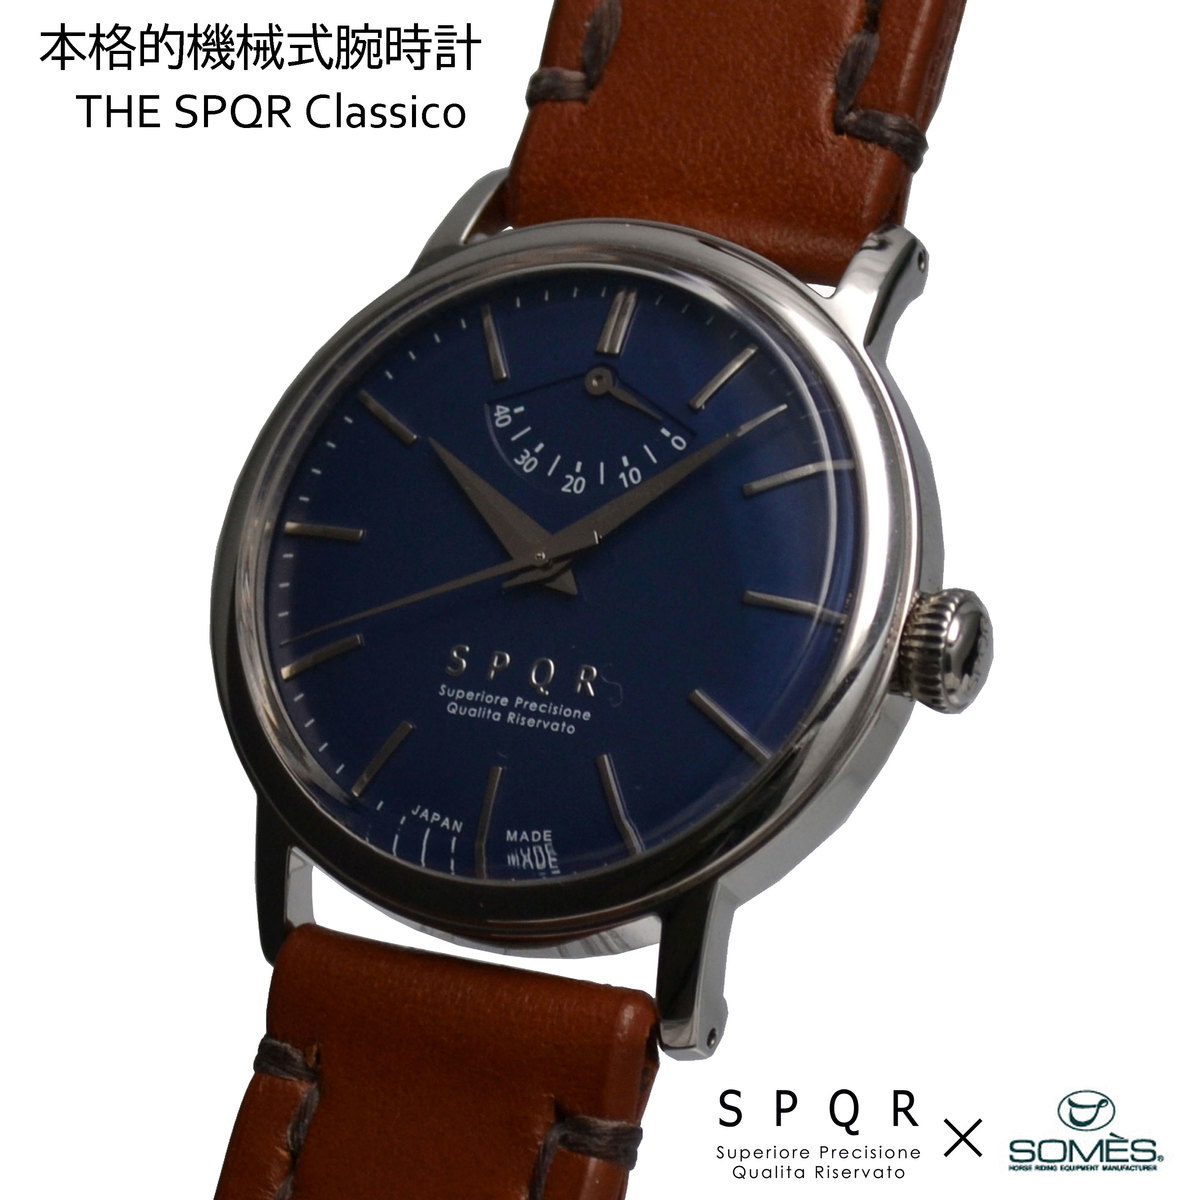 THE SPQR Classico 手巻パワーリザーブ(ネイビー)×日本で唯一の馬具メーカーSOMESの職人がハンドメイドで仕上げた渾身の4mm厚時計バンド 手巻き ウォッチ 日本製 国産時計 腕時計 機械式